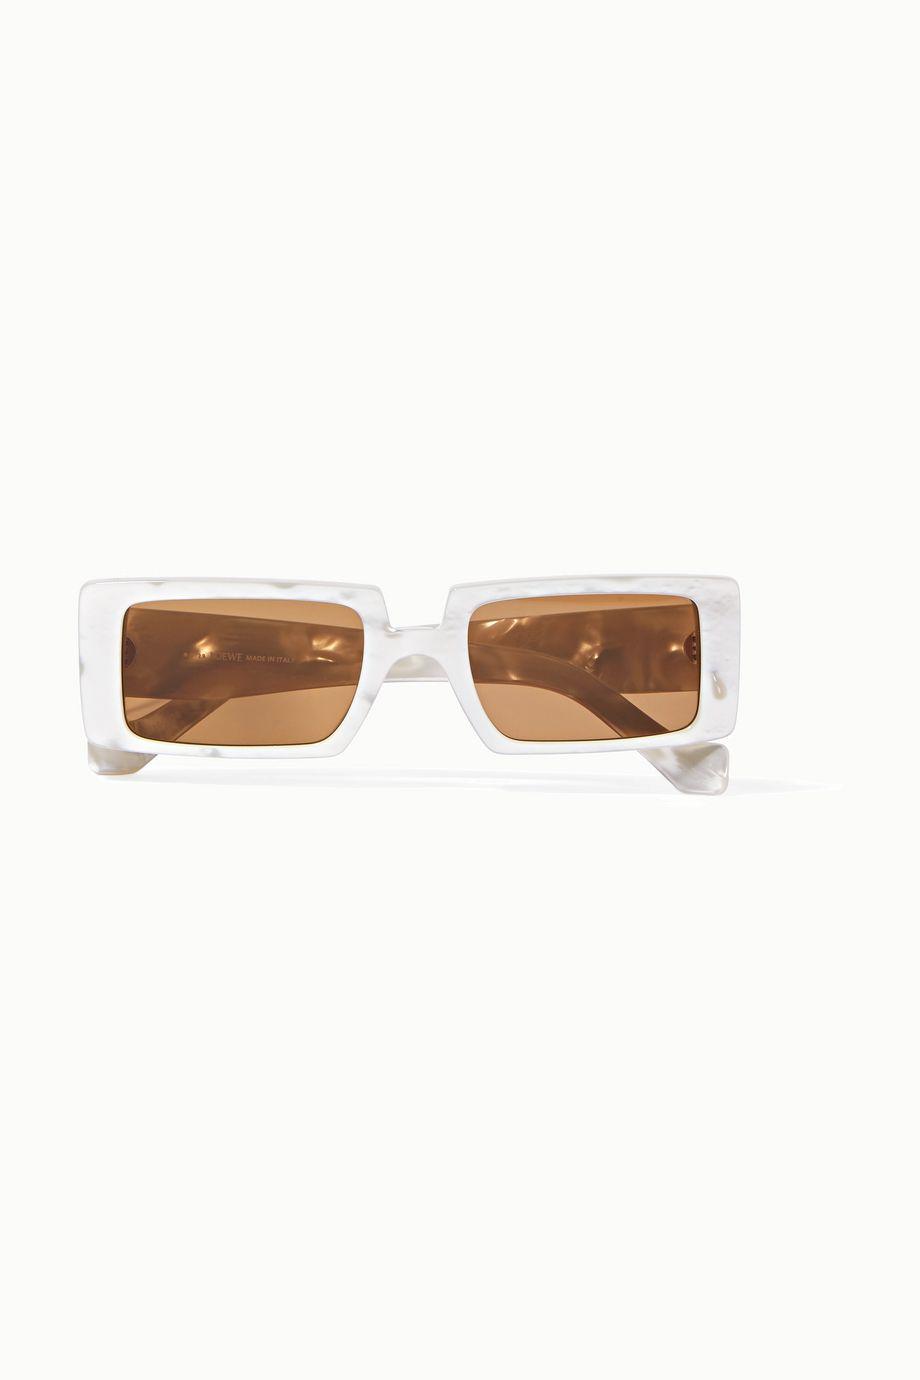 Loewe Square-frame marbled acetate sunglasses